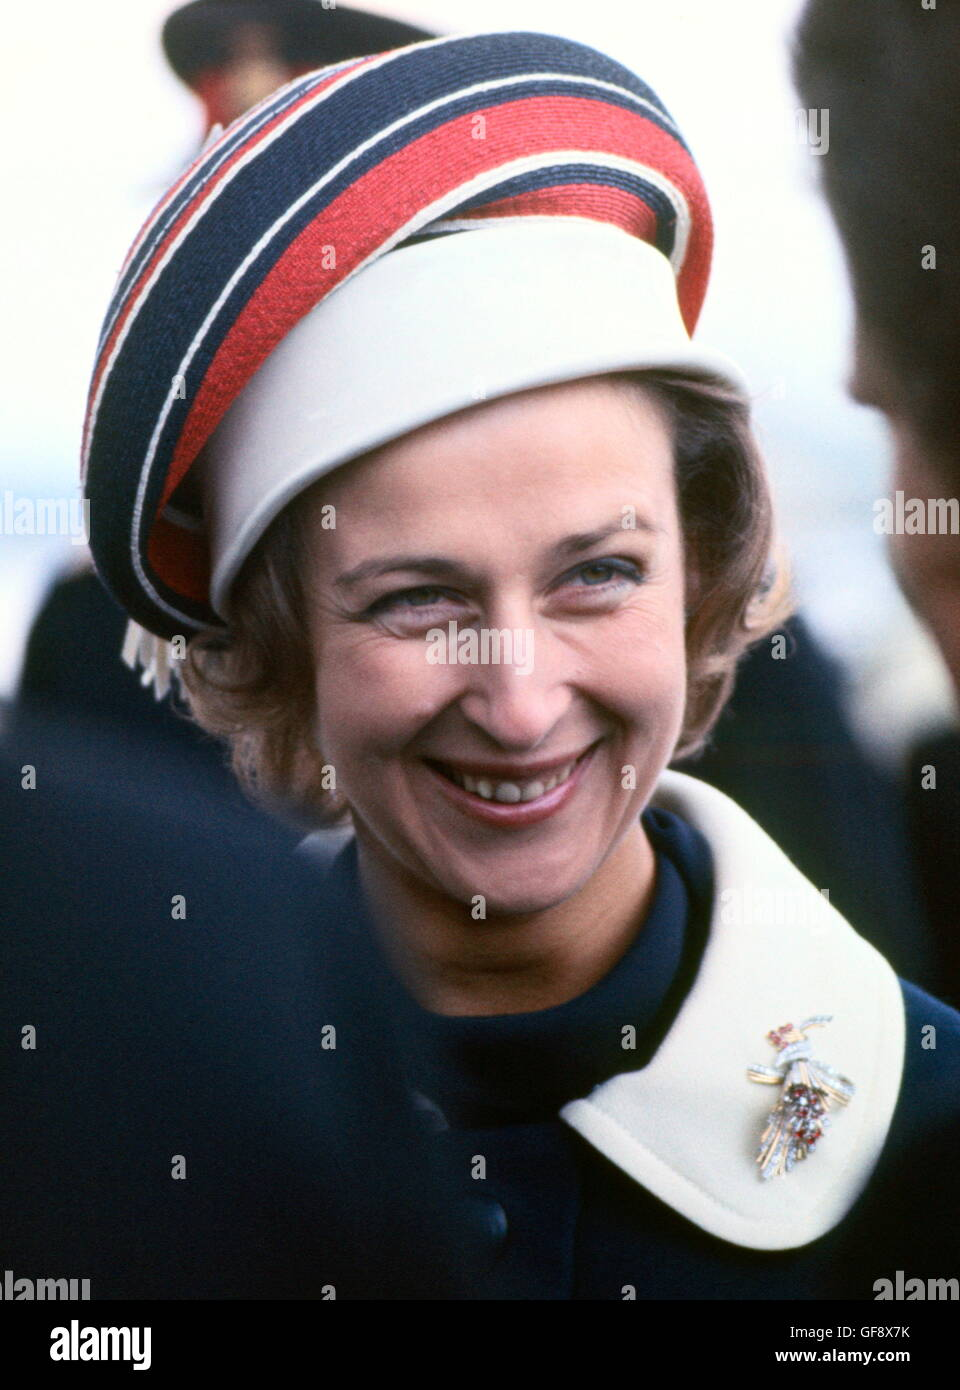 AJAXNETPHOTO. 27Aprile, 1970. GOSPORT, Inghilterra. - La Principessa nomi YACHT - S.A.R. la Principessa Alexandra, Immagini Stock